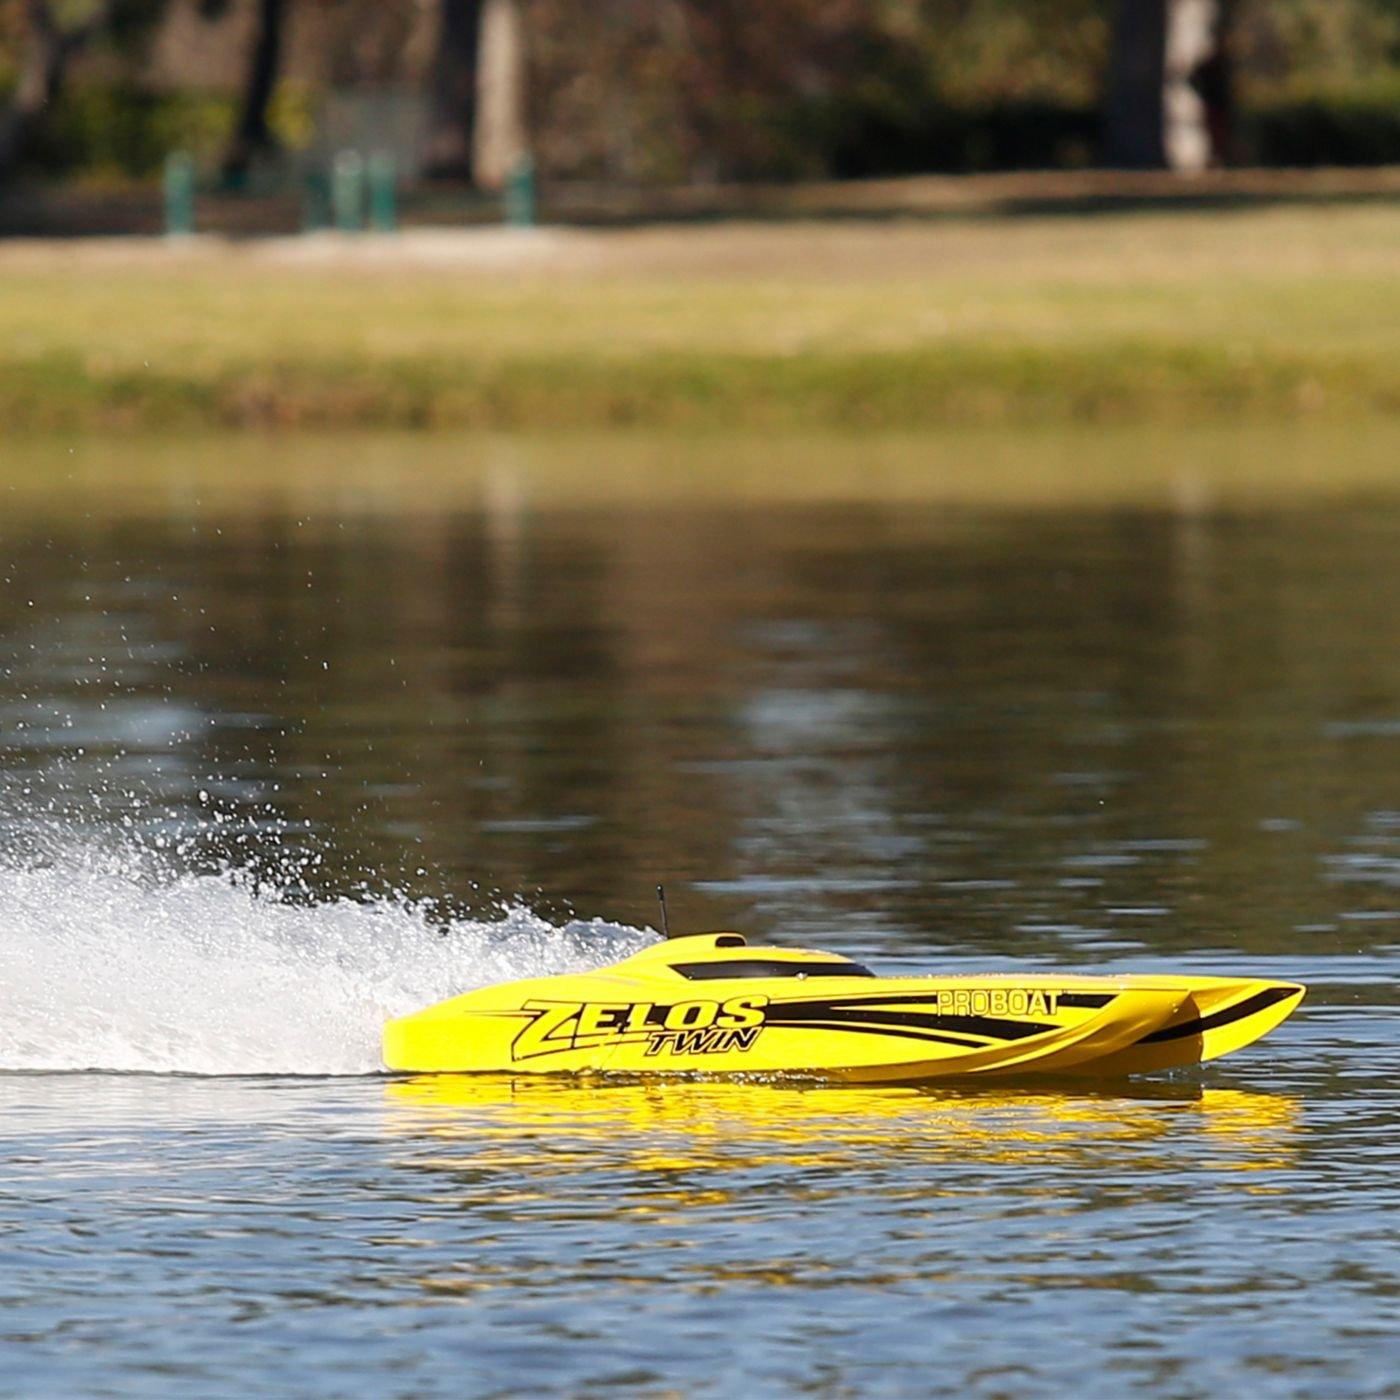 Amazon.com: Pro Boat Zelos 36 Twin Catamaran BL RTR RC Boat: Toys ...